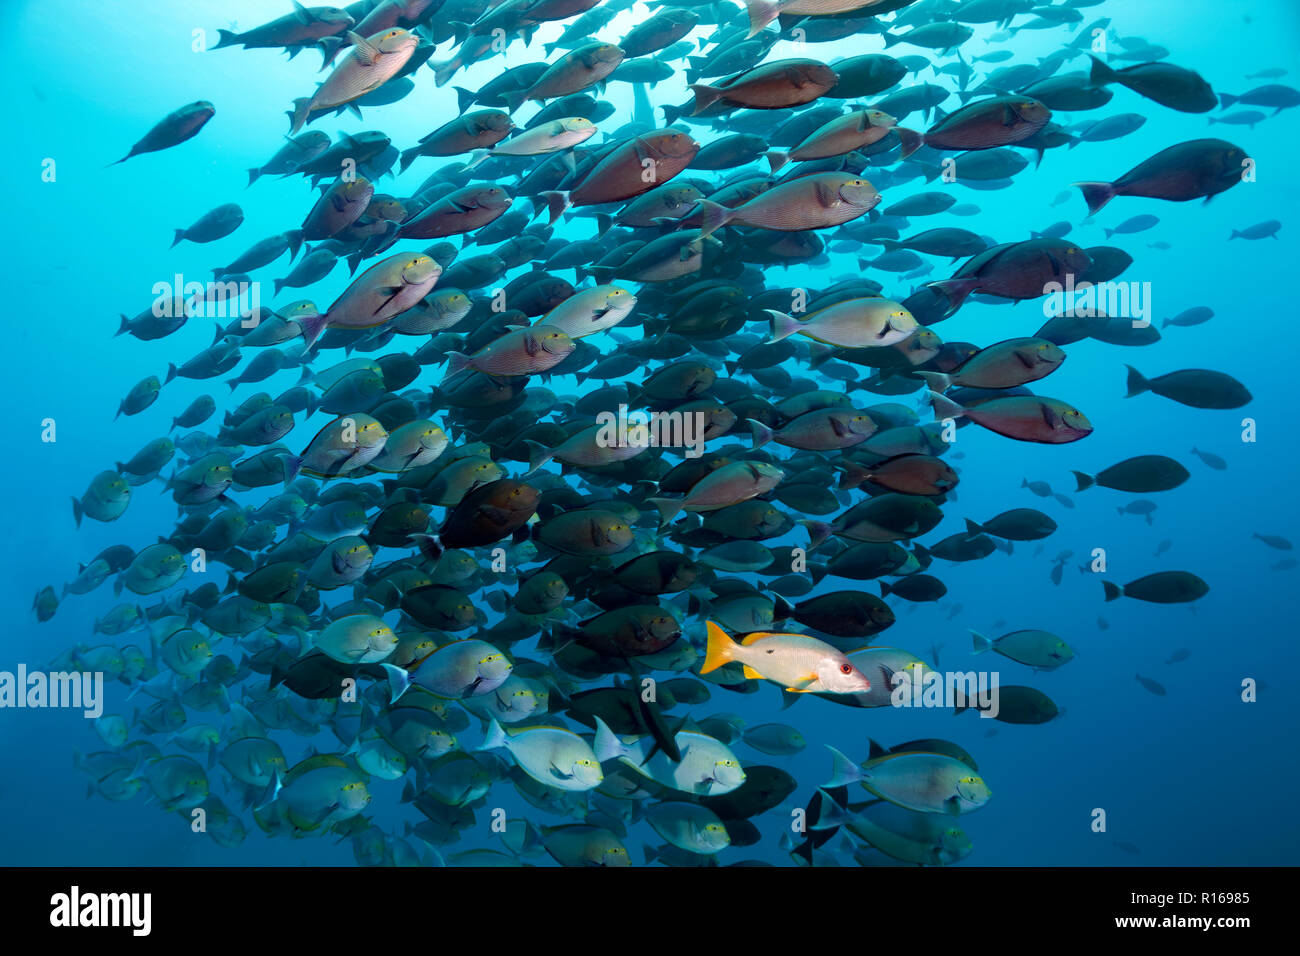 Schoolmaster snapper (Lutjanus apodus) associated with swarm Elongate Surgeonfish (Acanthurus mata), Pacific, Queensland - Stock Image